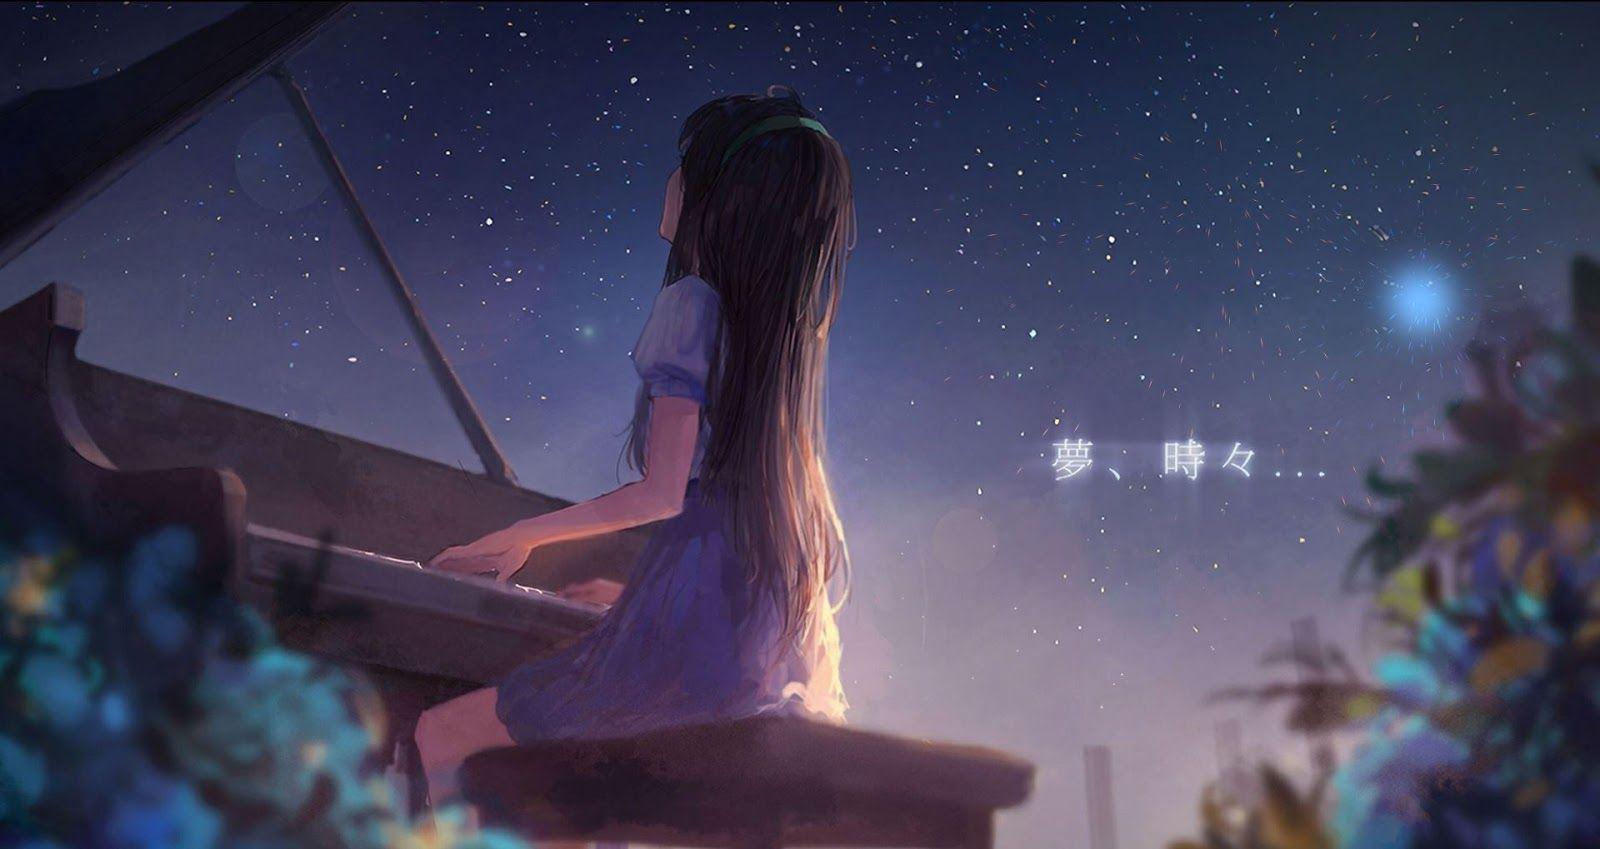 Under The Fireworks | Animated, Parallax, BGM [Wallpaper Engine Anime] 4K